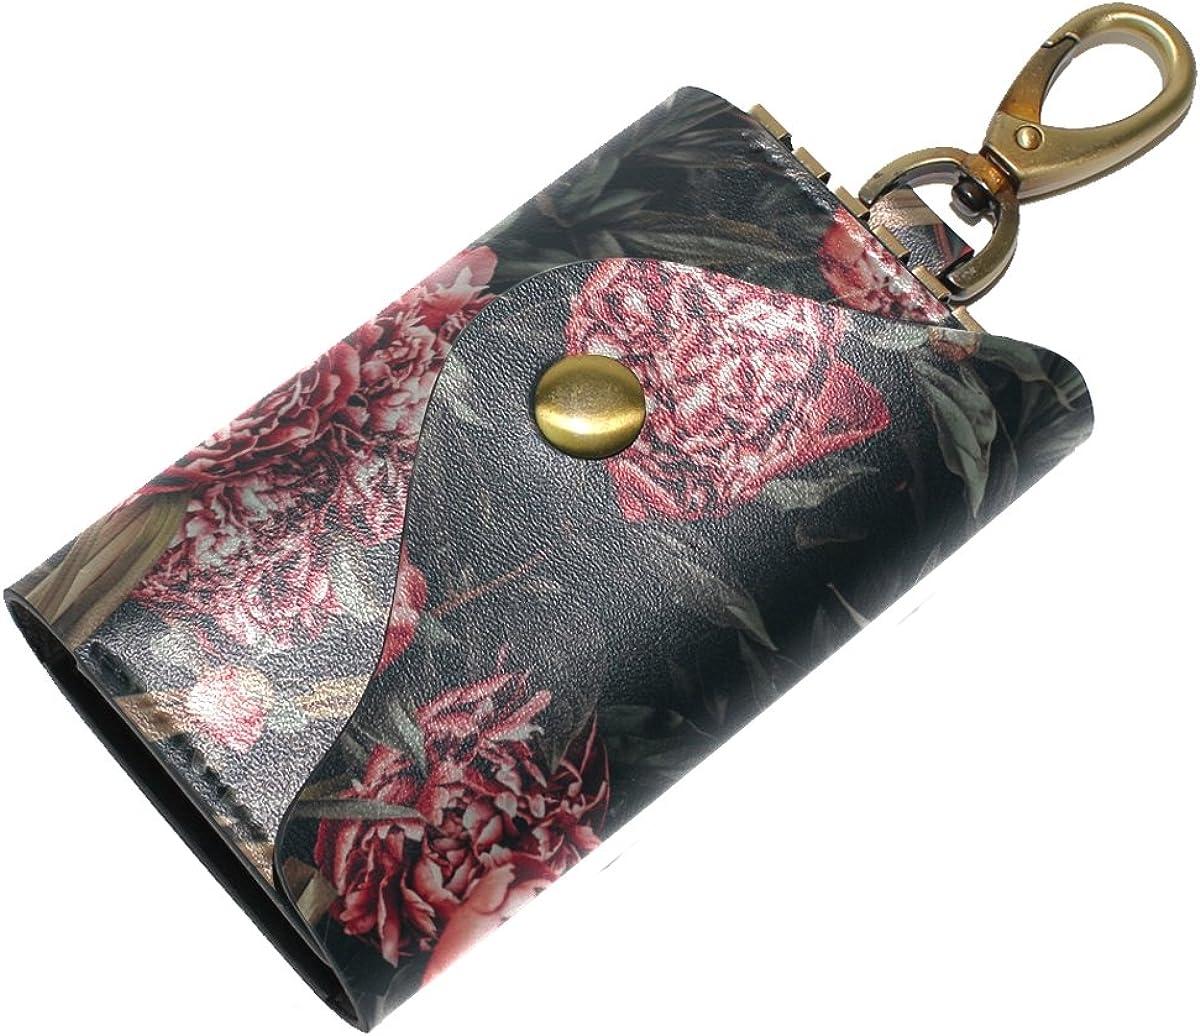 DEYYA Red Peonies Painting Leather Key Case Wallets Unisex Keychain Key Holder with 6 Hooks Snap Closure